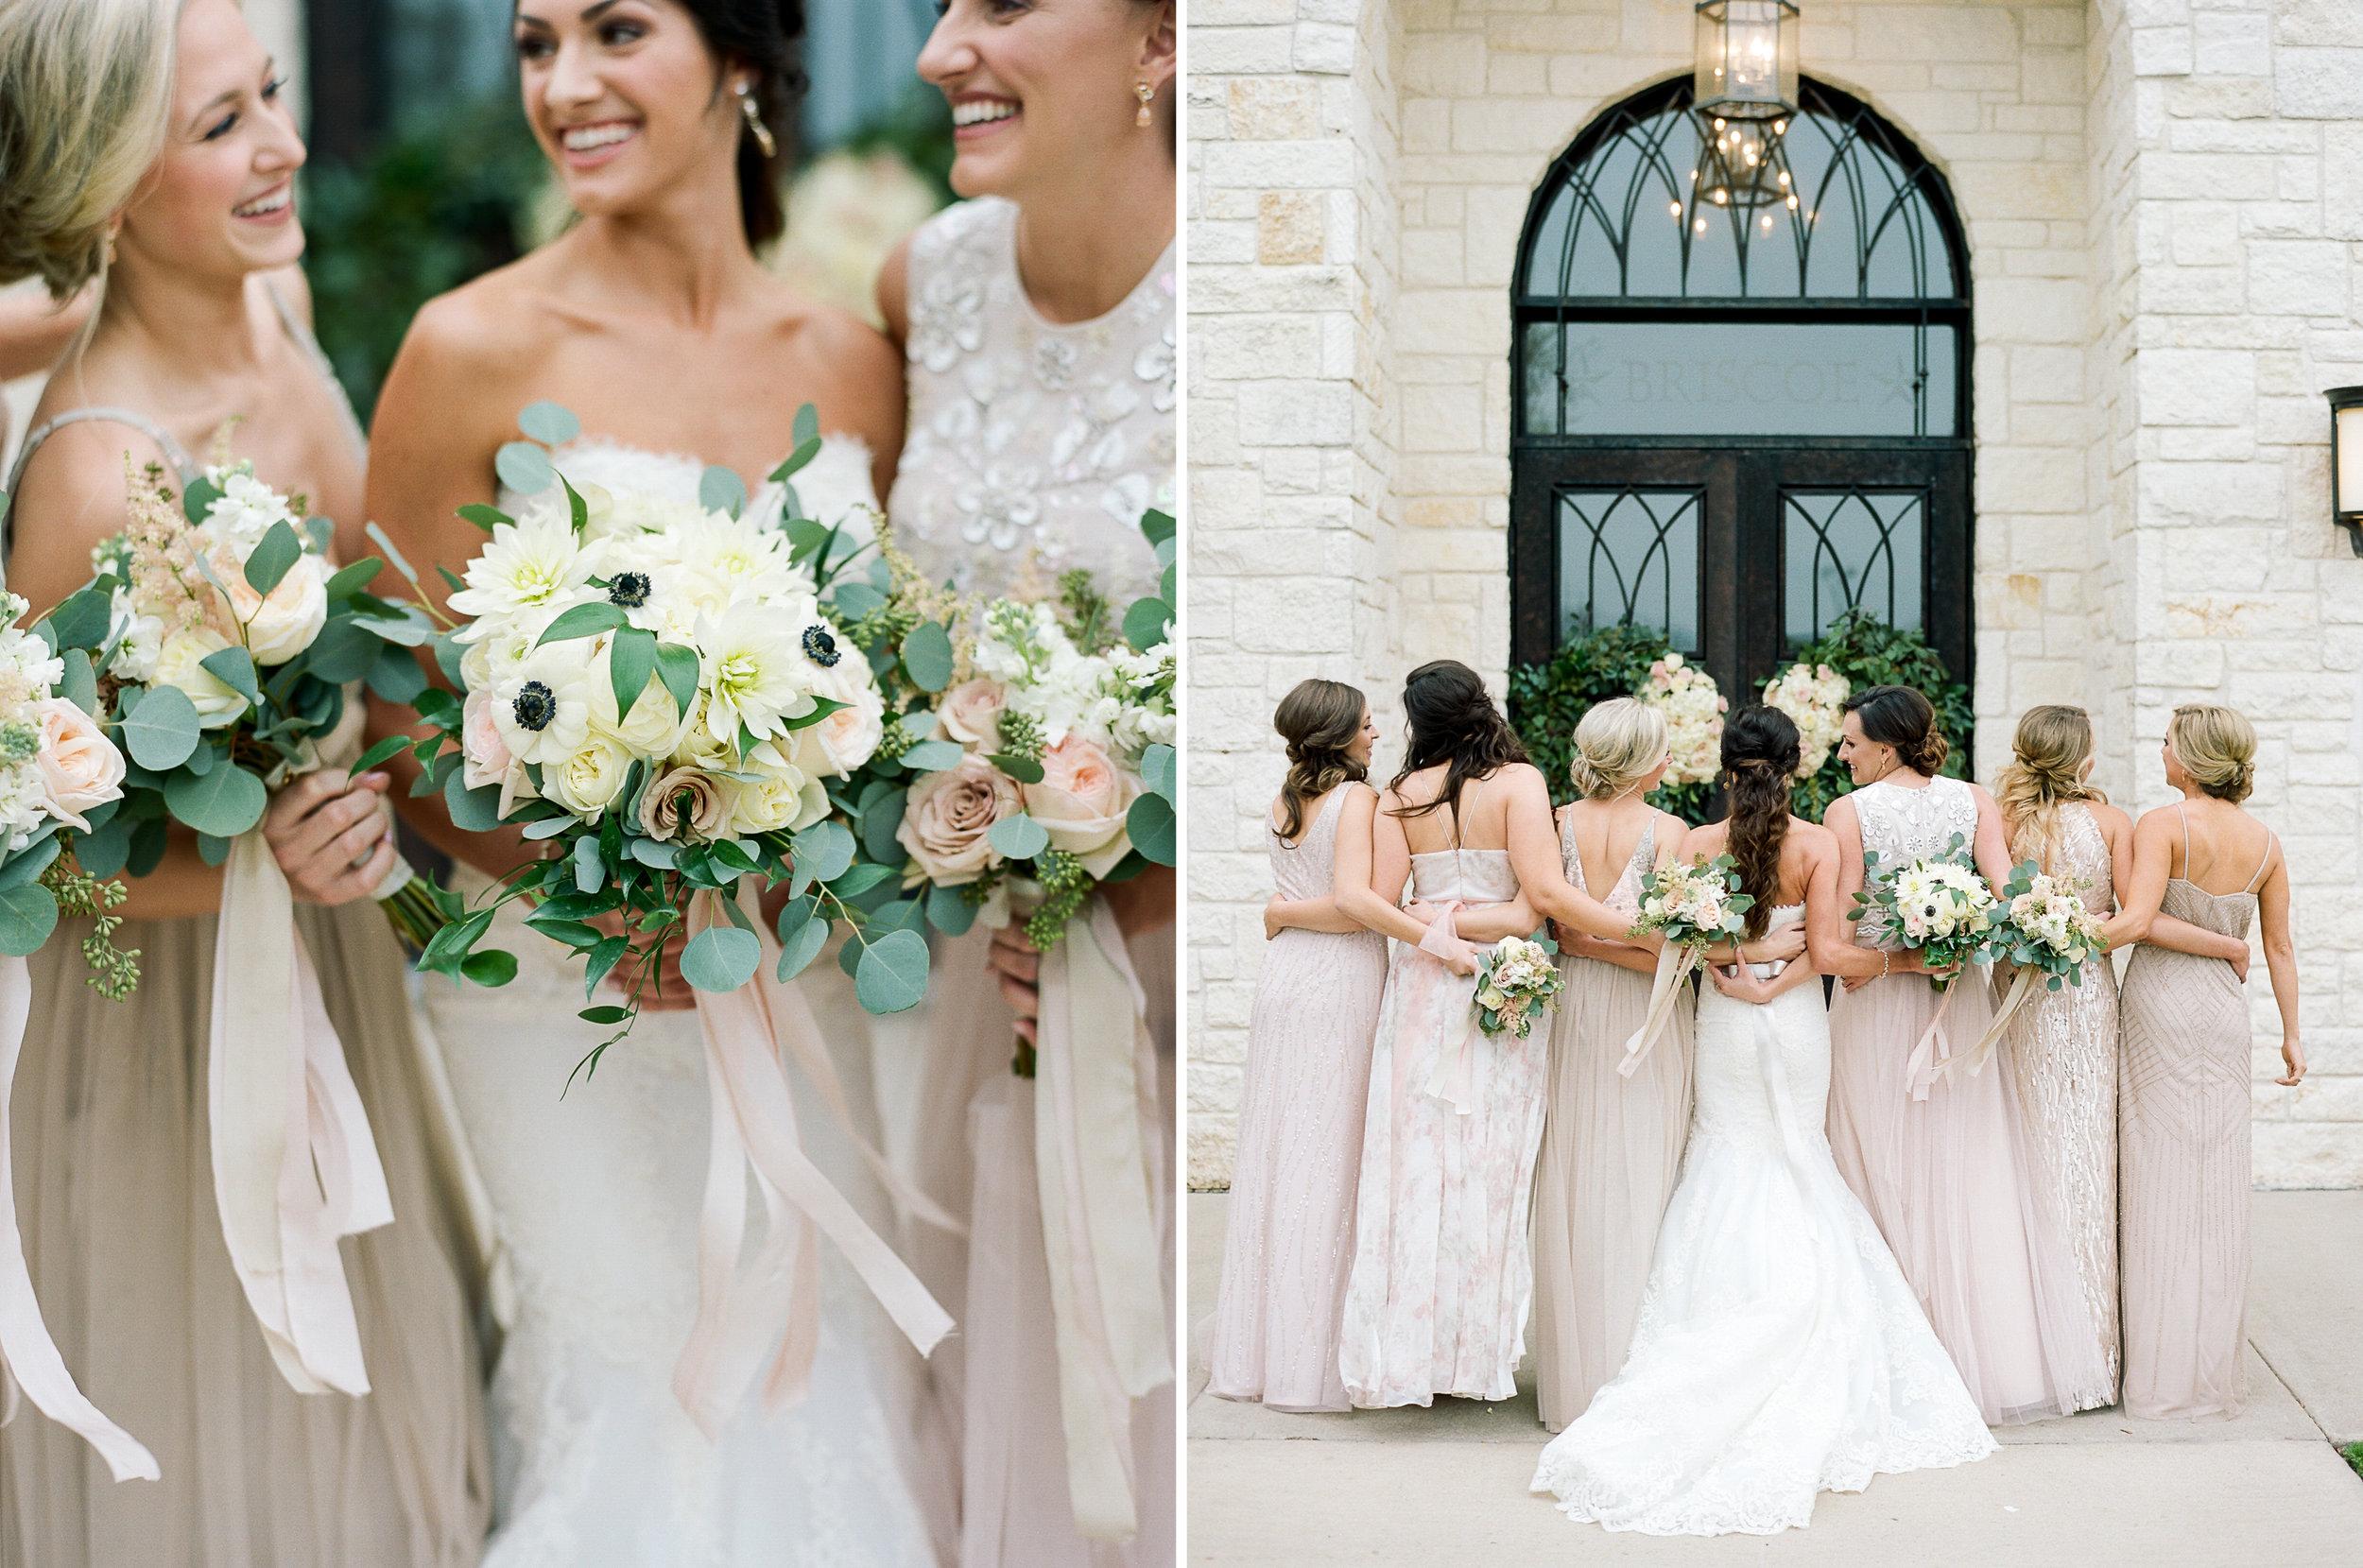 Briscoe-Manor-Houston-Wedding-Photographer-Modern-Luxury-Weddings-Dana-Fernandez-Photograpy-Fine-Art-Photographer-Houston-Film-Destination-PNW-Wedding-Photographer-105.jpg